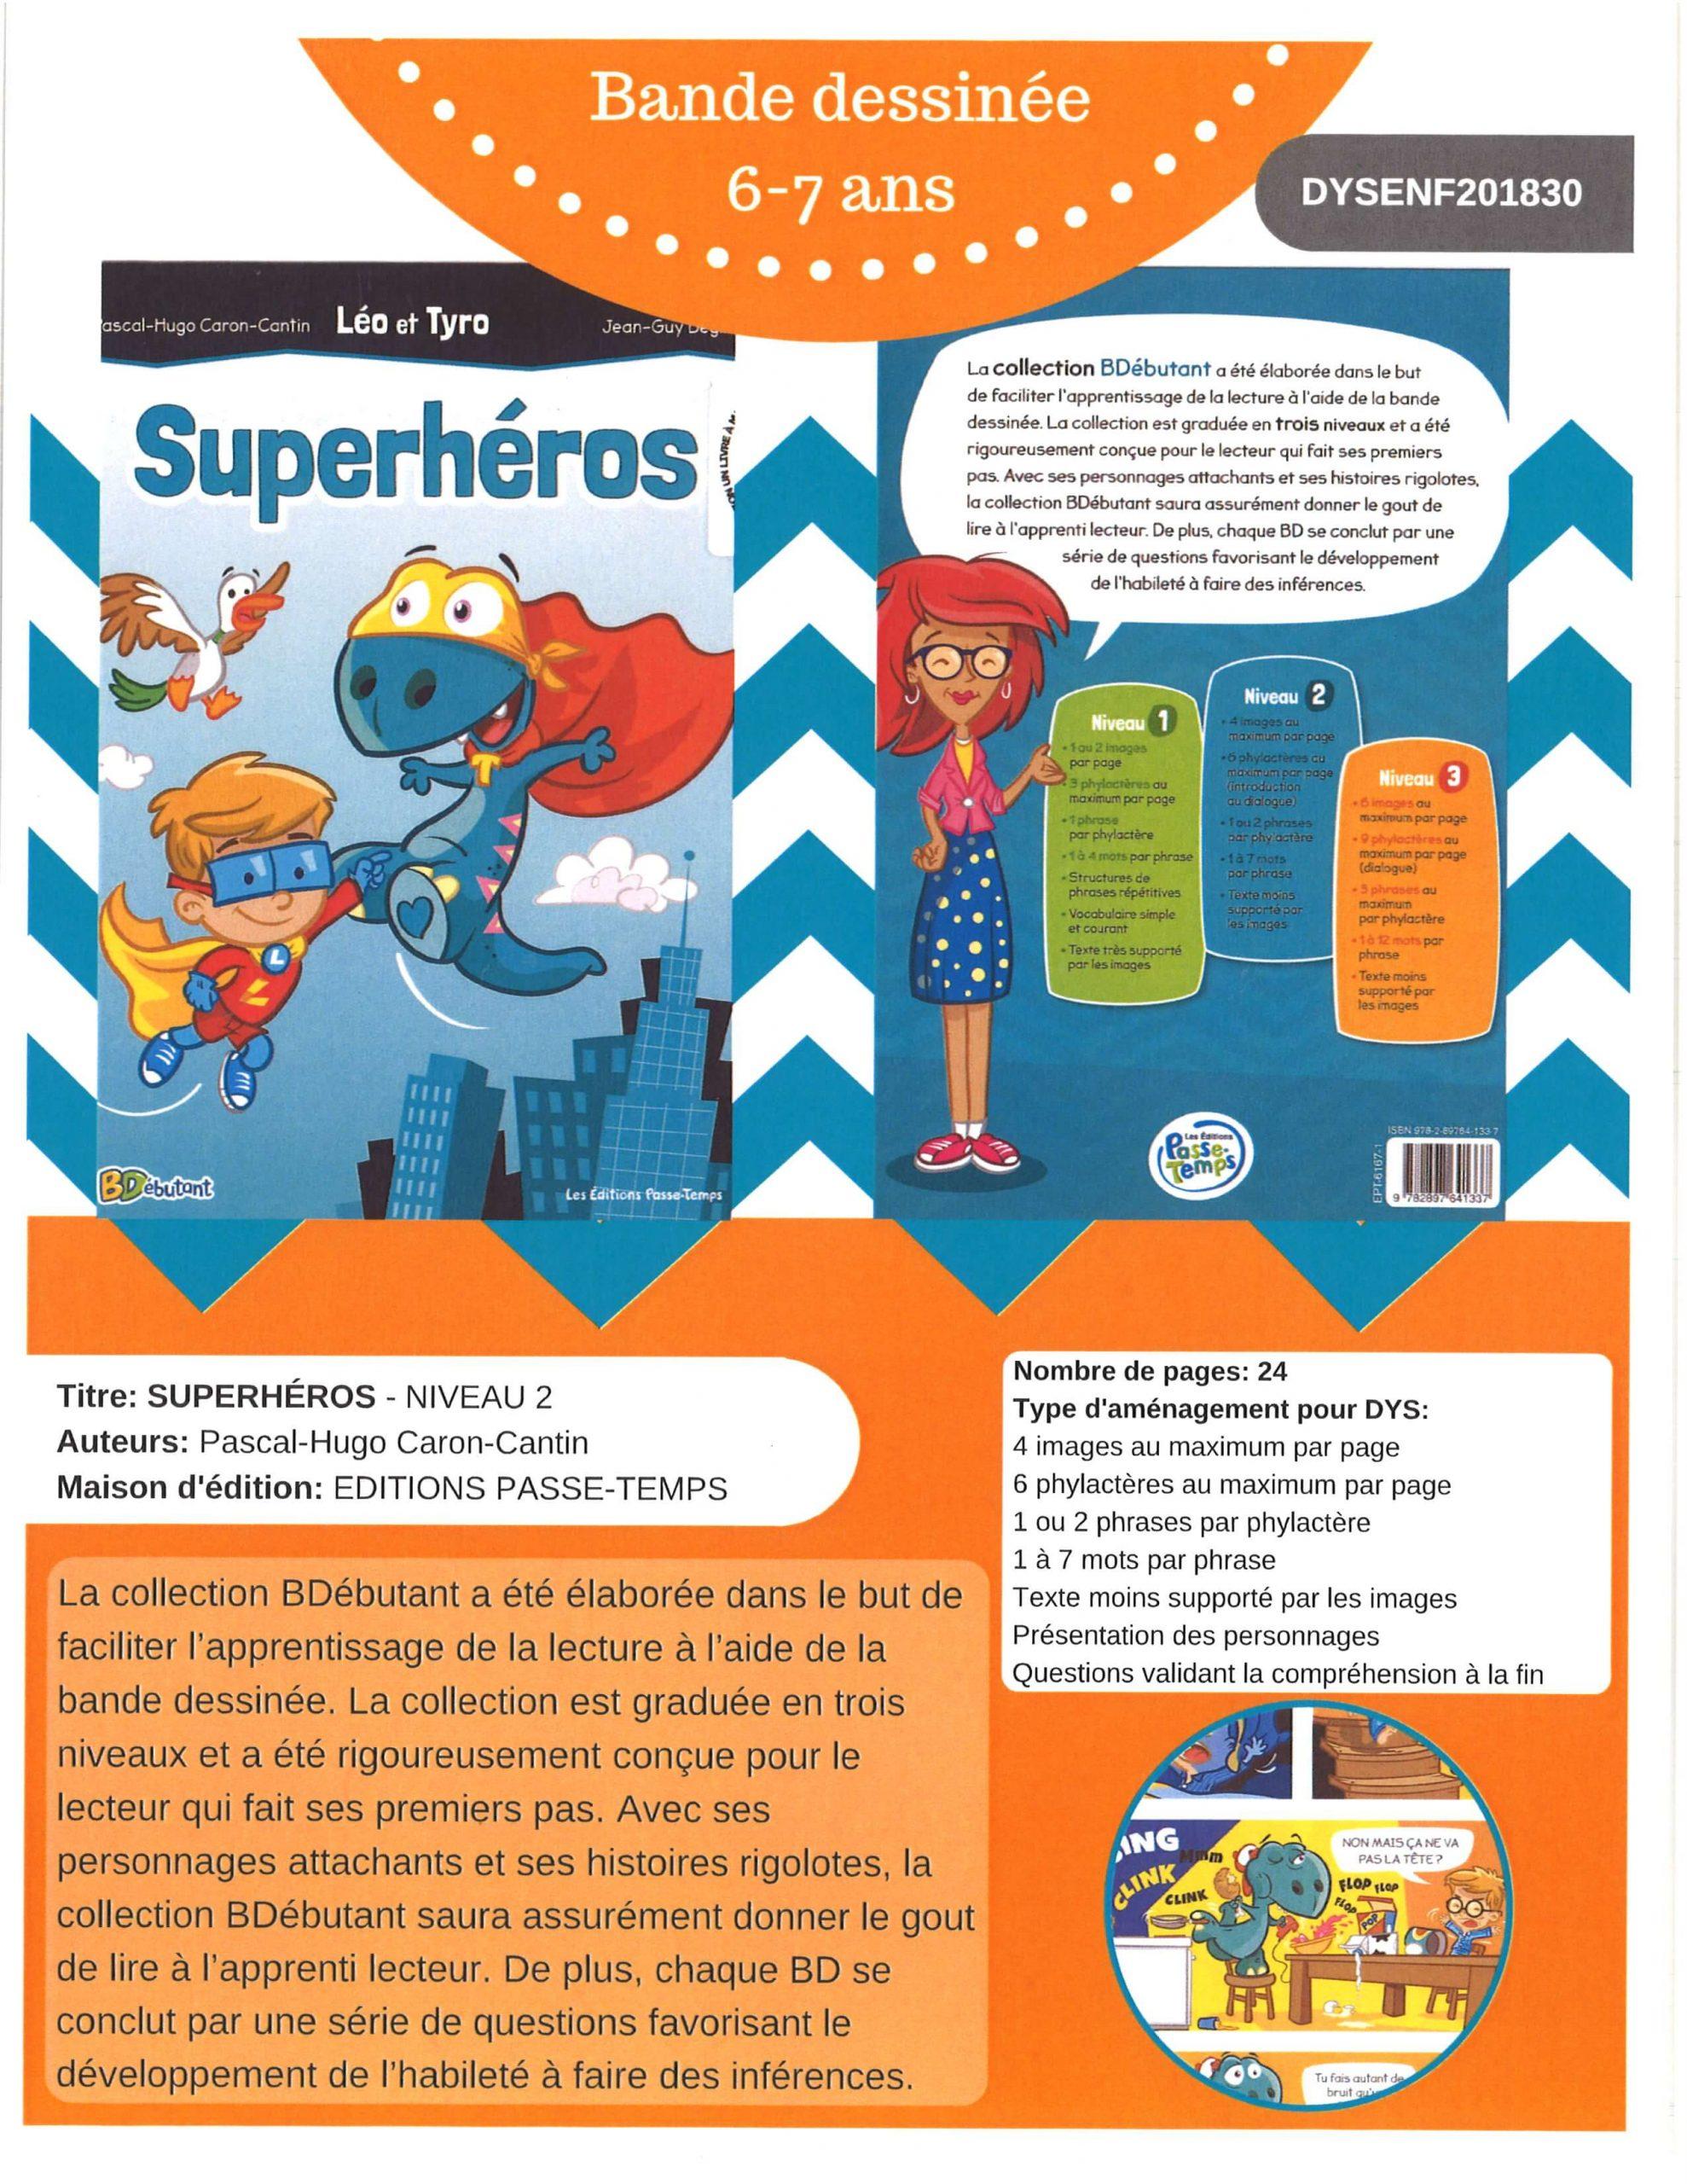 Superhéros - Niveau 2 Image